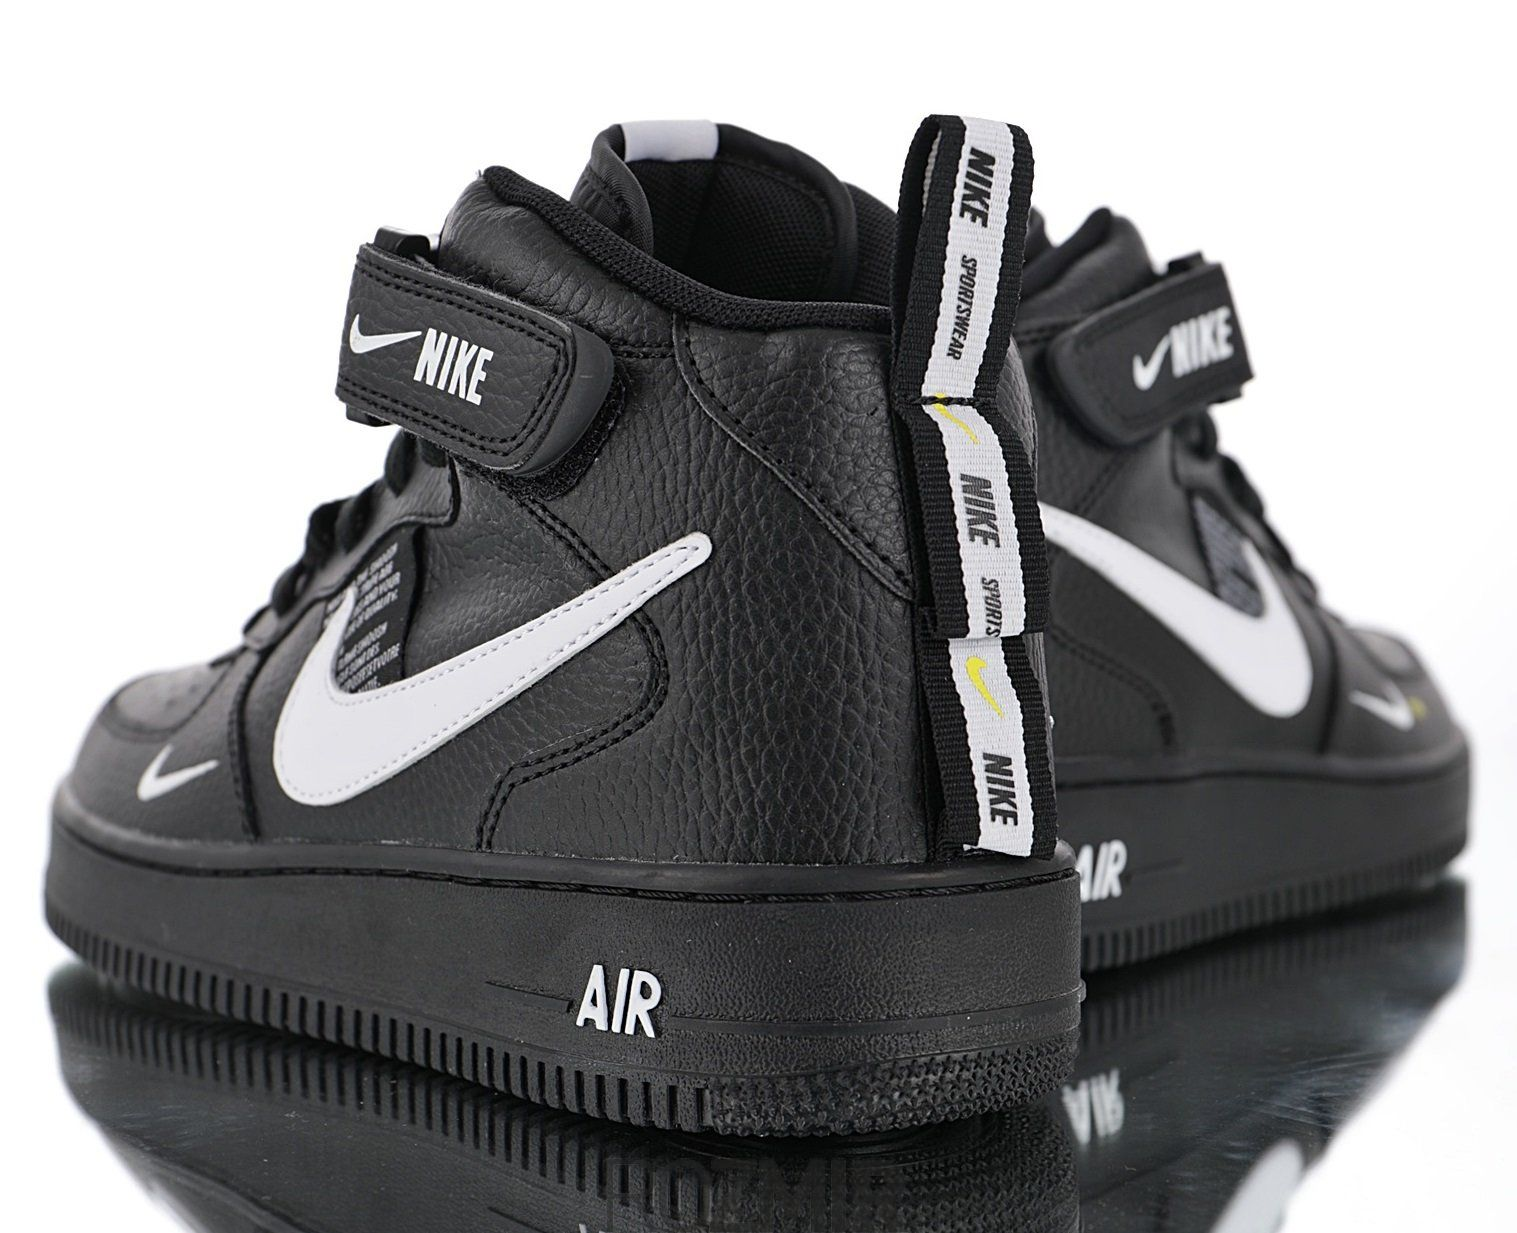 338d0279 Мужские кроссовки Nike Air Force 1 Mid 07 LV8 Utility